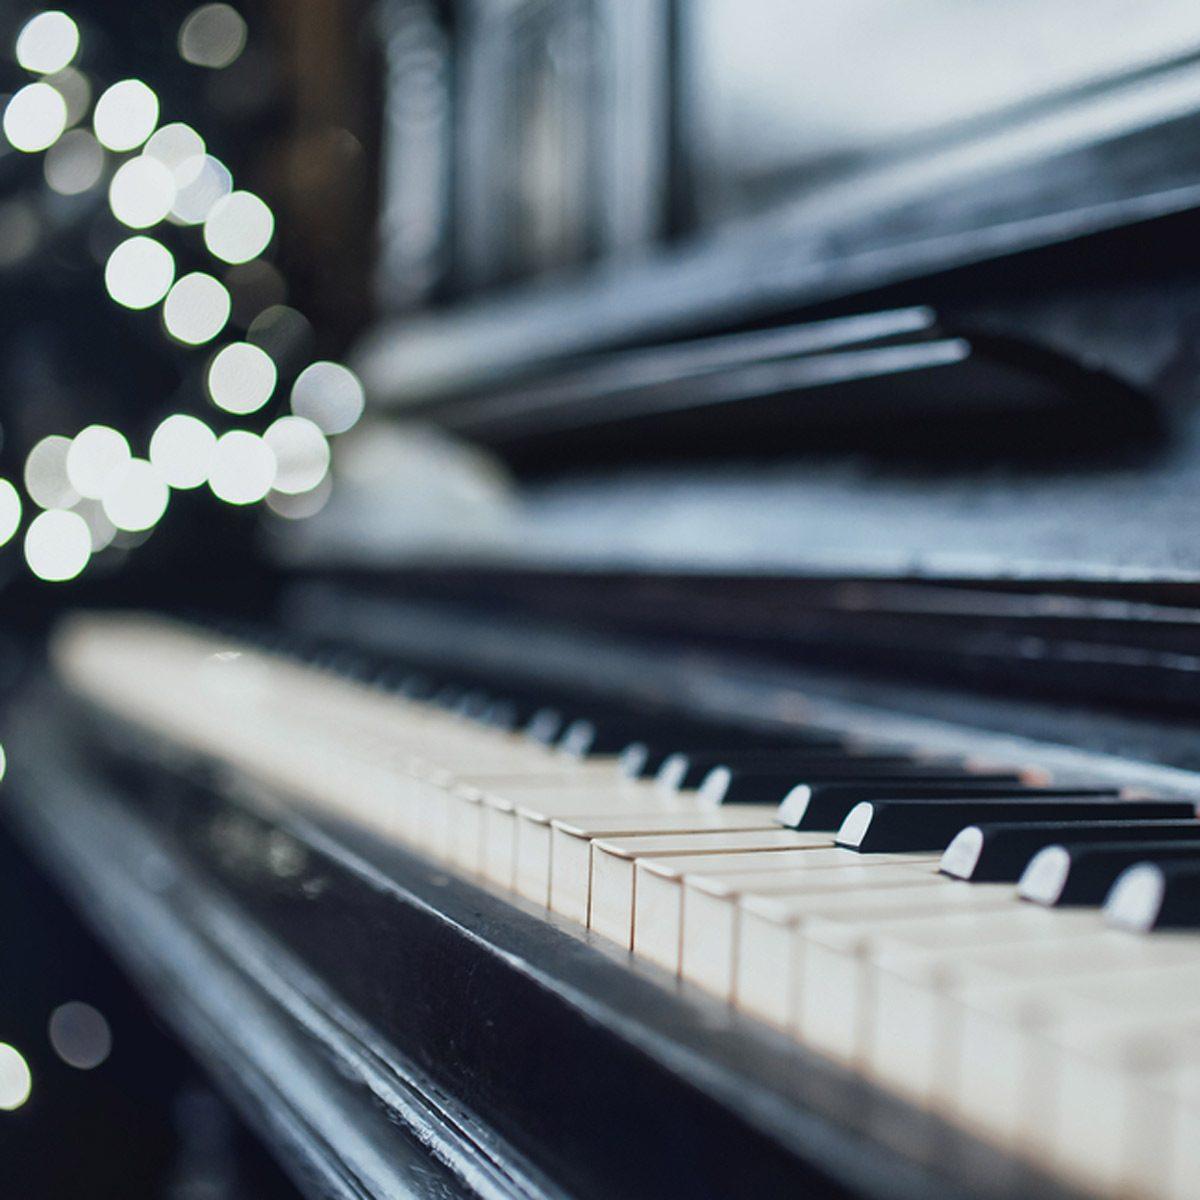 shutterstock_553722994 piano